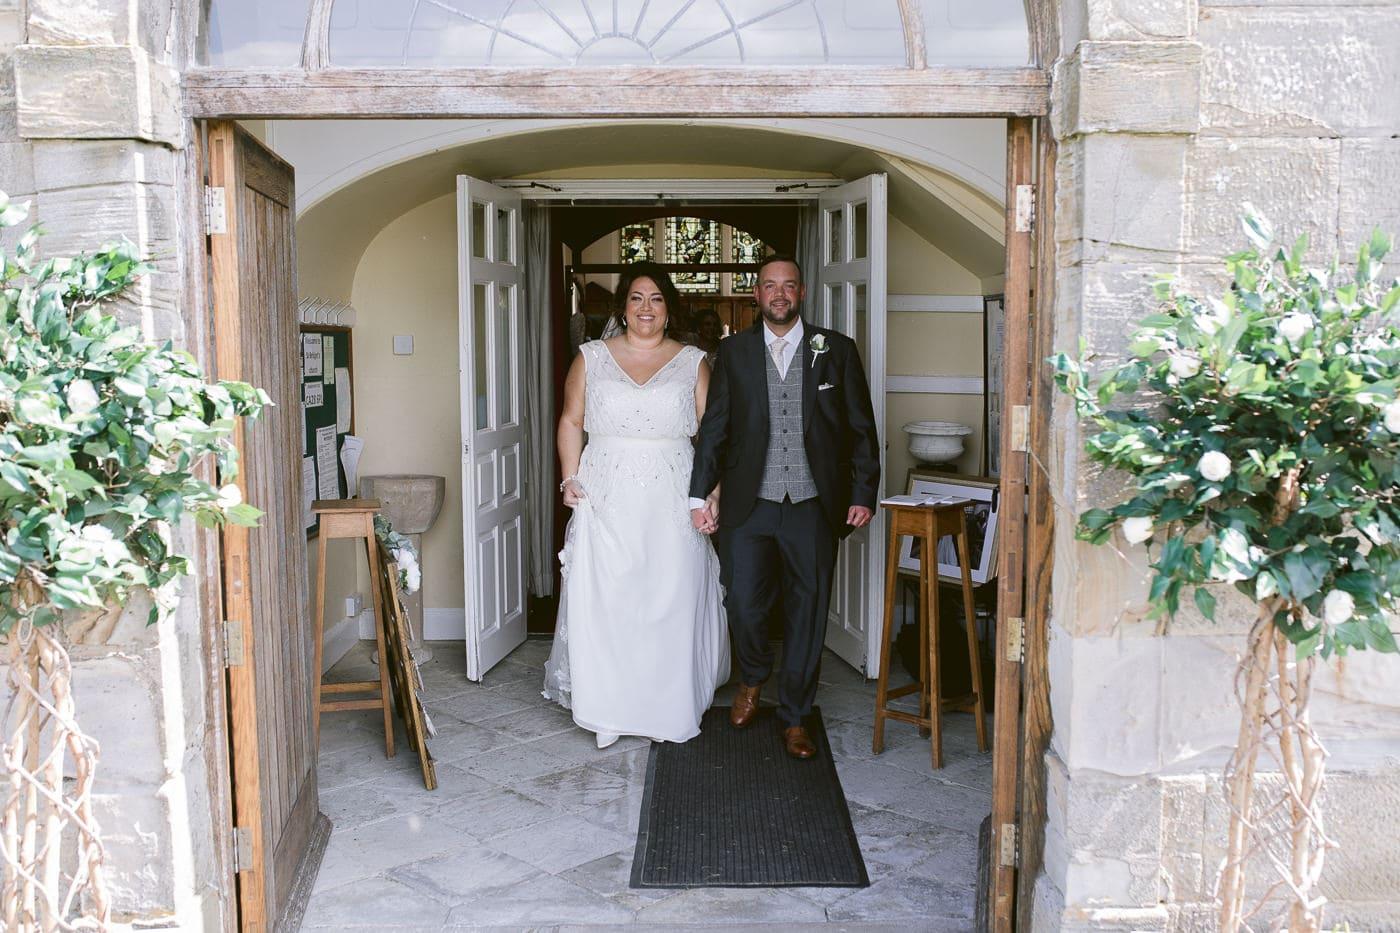 Entrance Walk Photography Wedding Portrait Photo Session